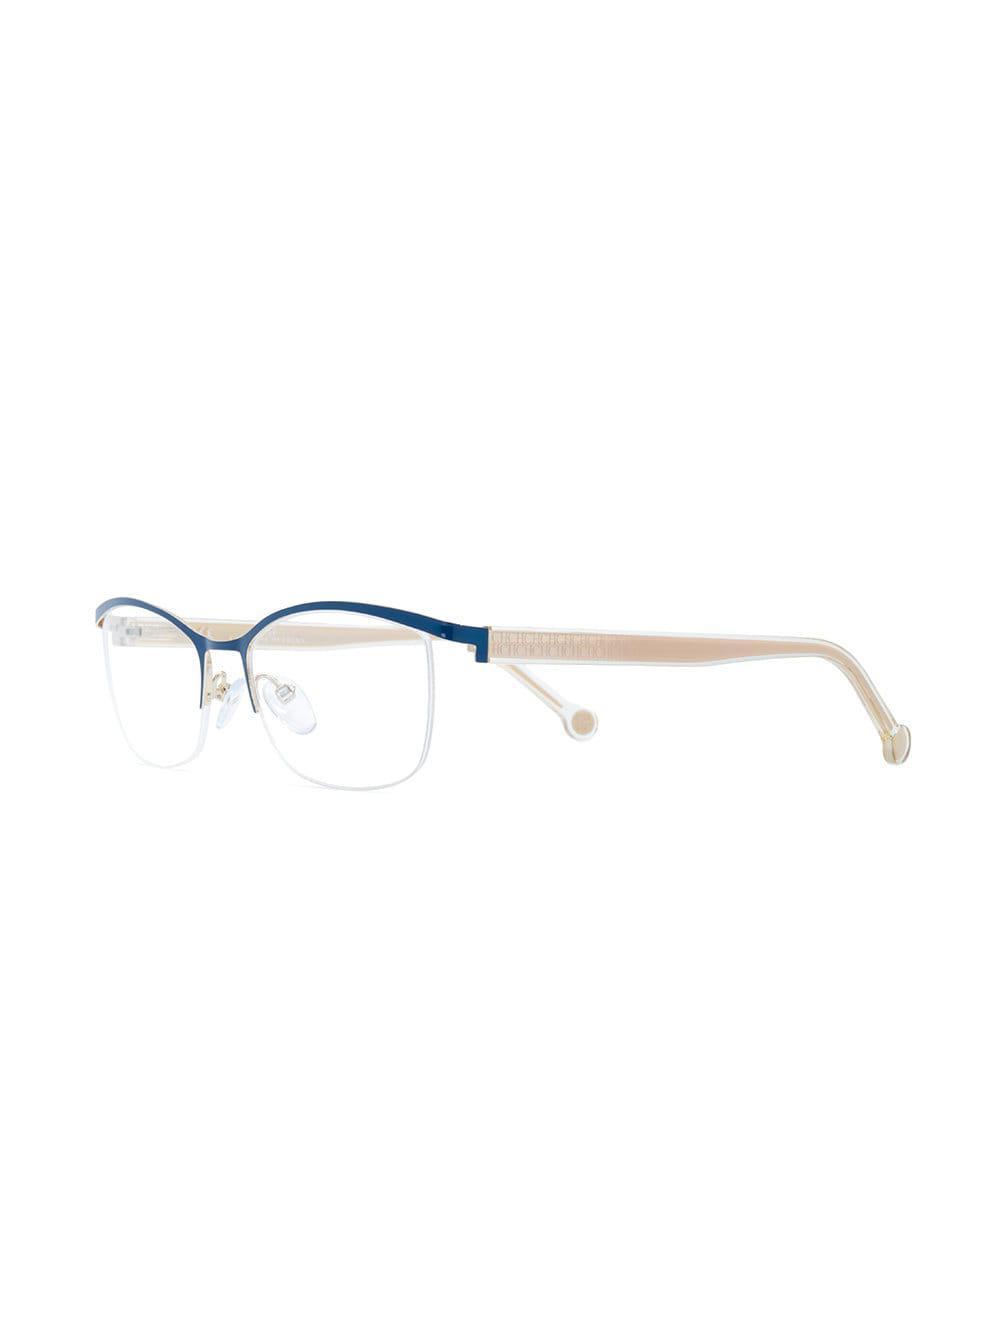 3be1845763 CH by Carolina Herrera - Multicolor Rectangular Shape Glasses - Lyst. View  fullscreen